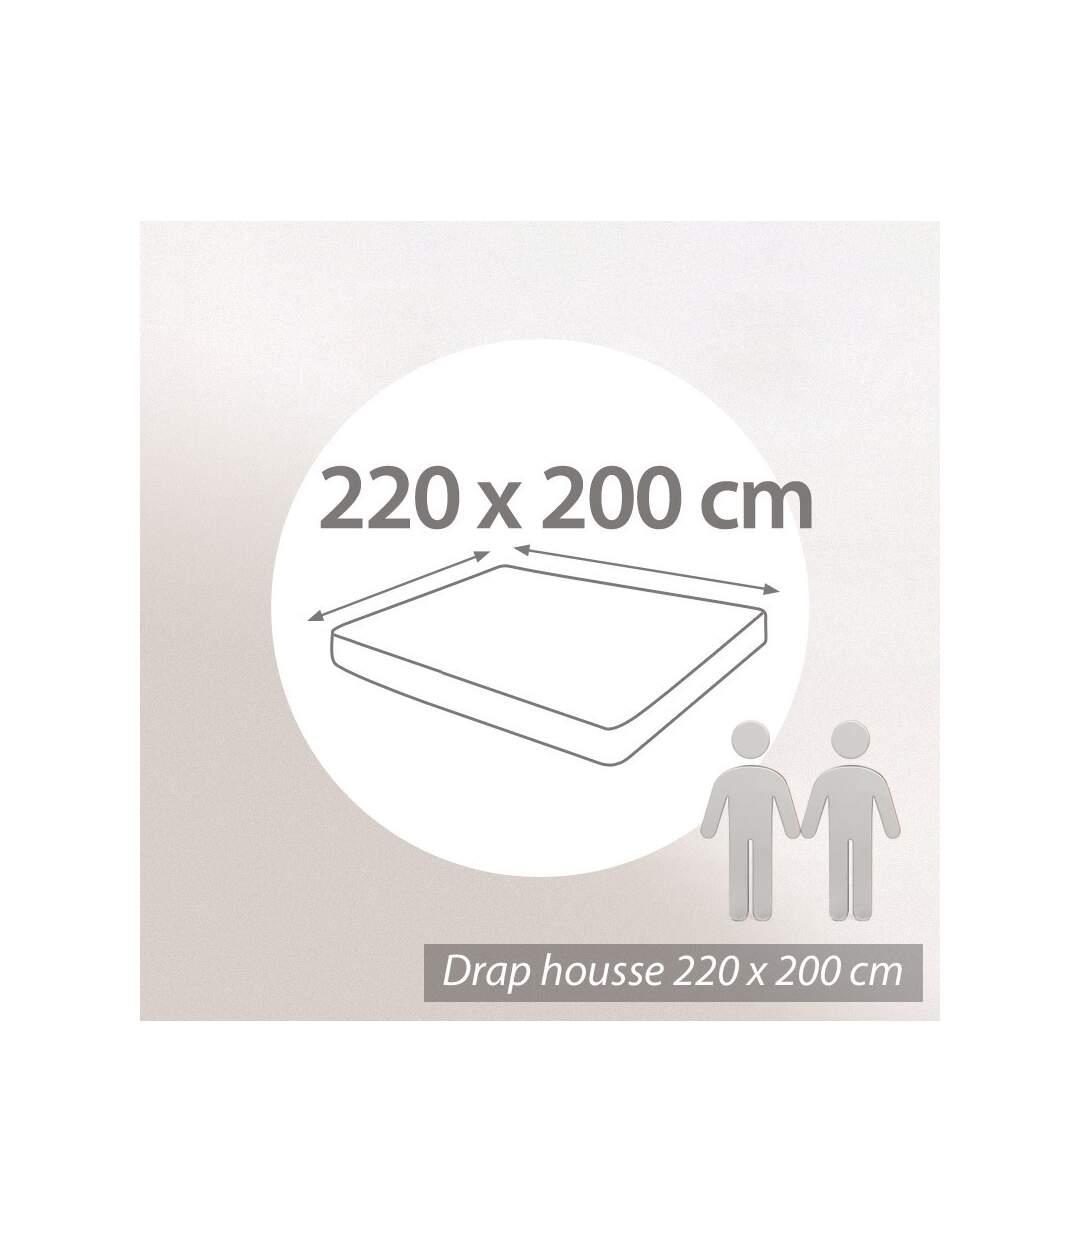 Protège matelas imperméable Antony blanc 220x200